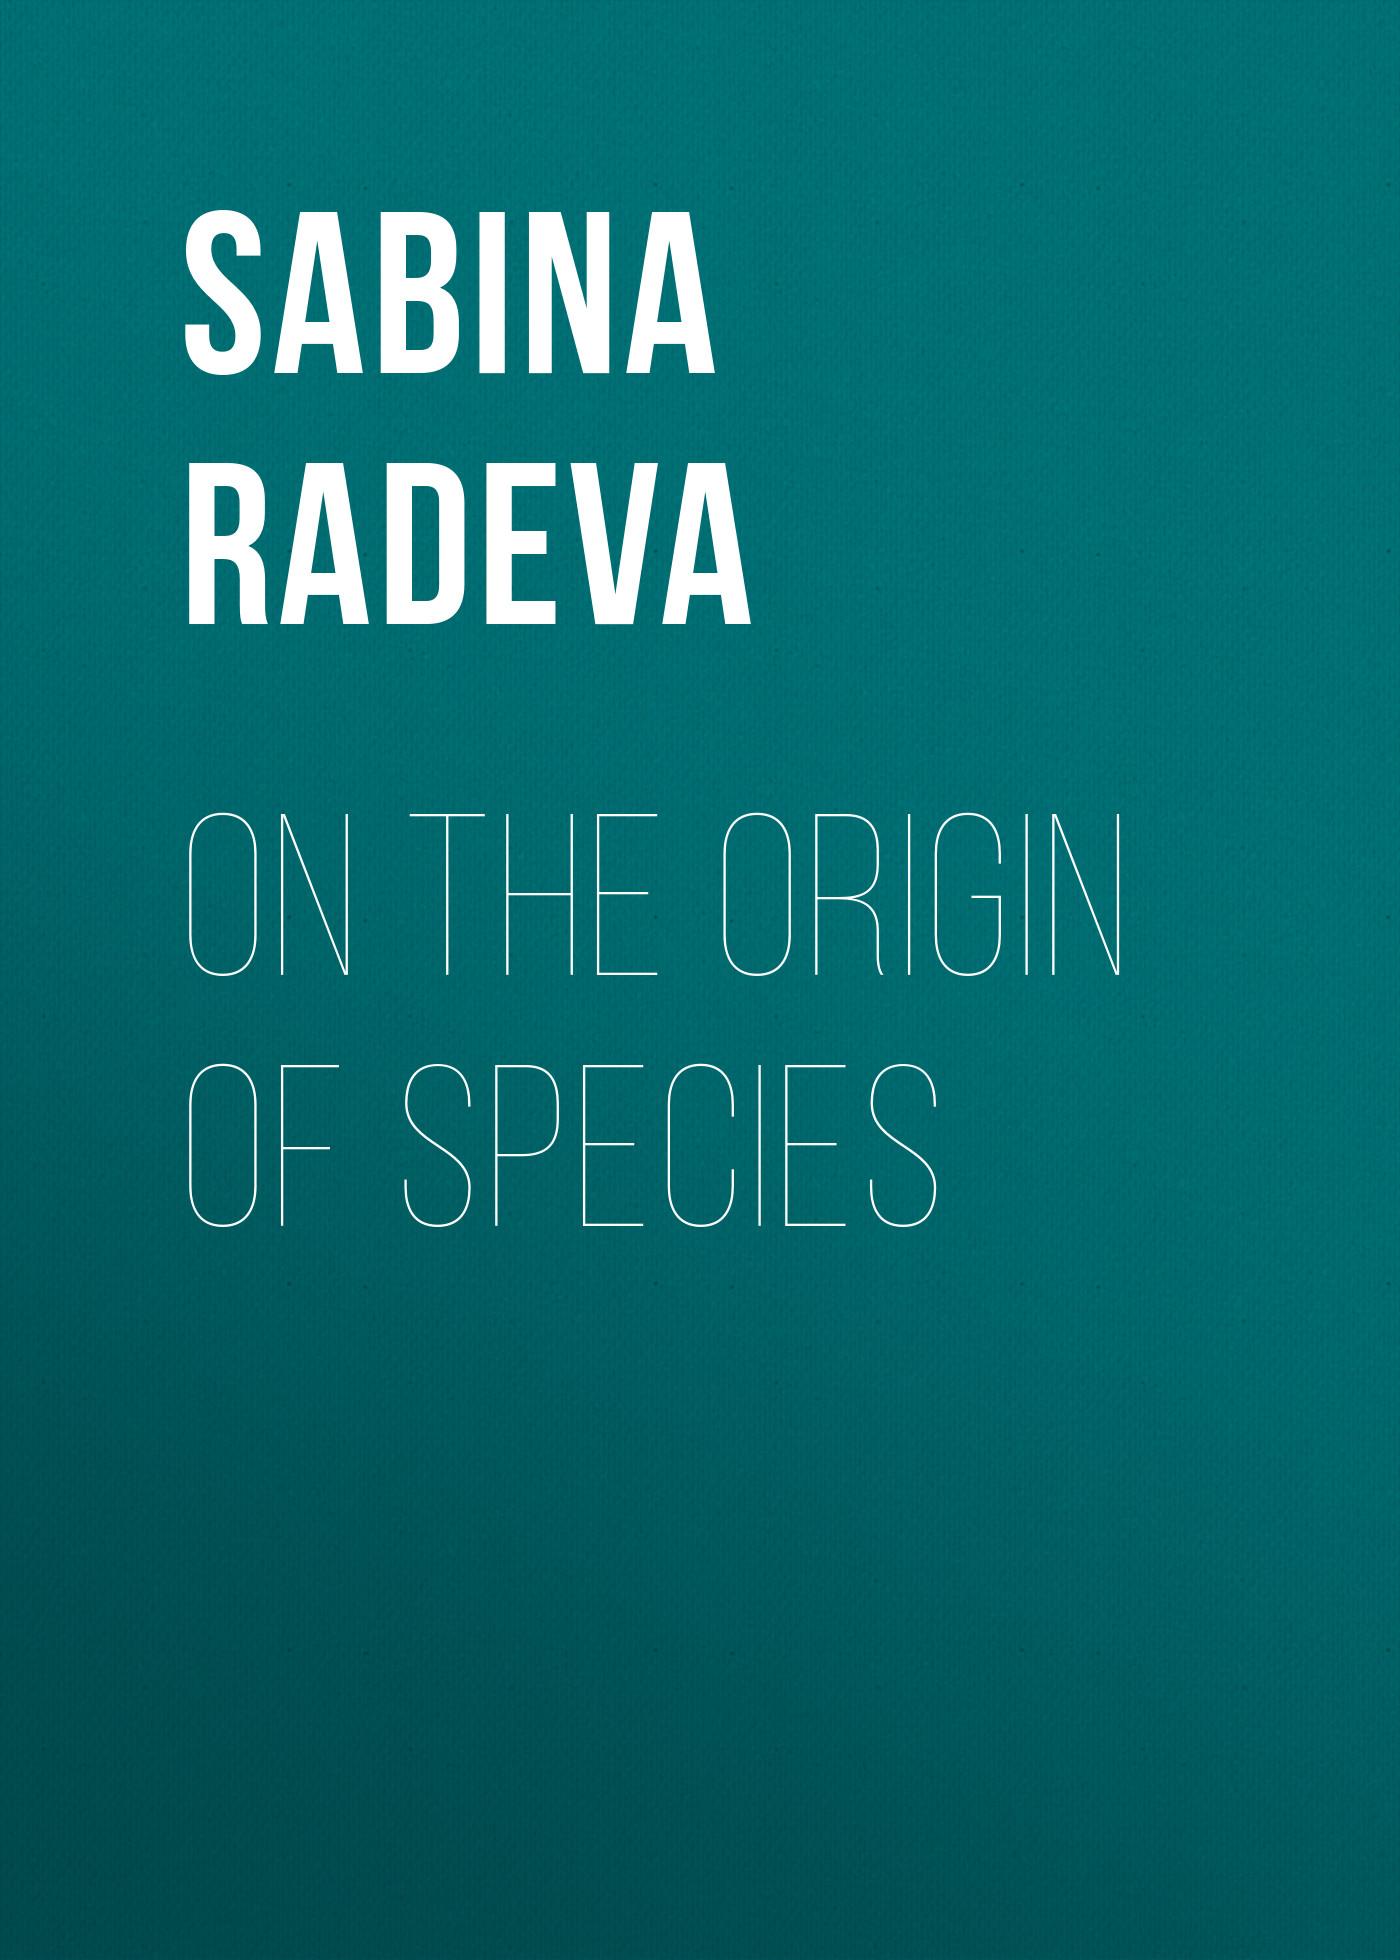 Sabina Radeva On The Origin of Species wilhelm heinrich immanuel bleek on the origin of language